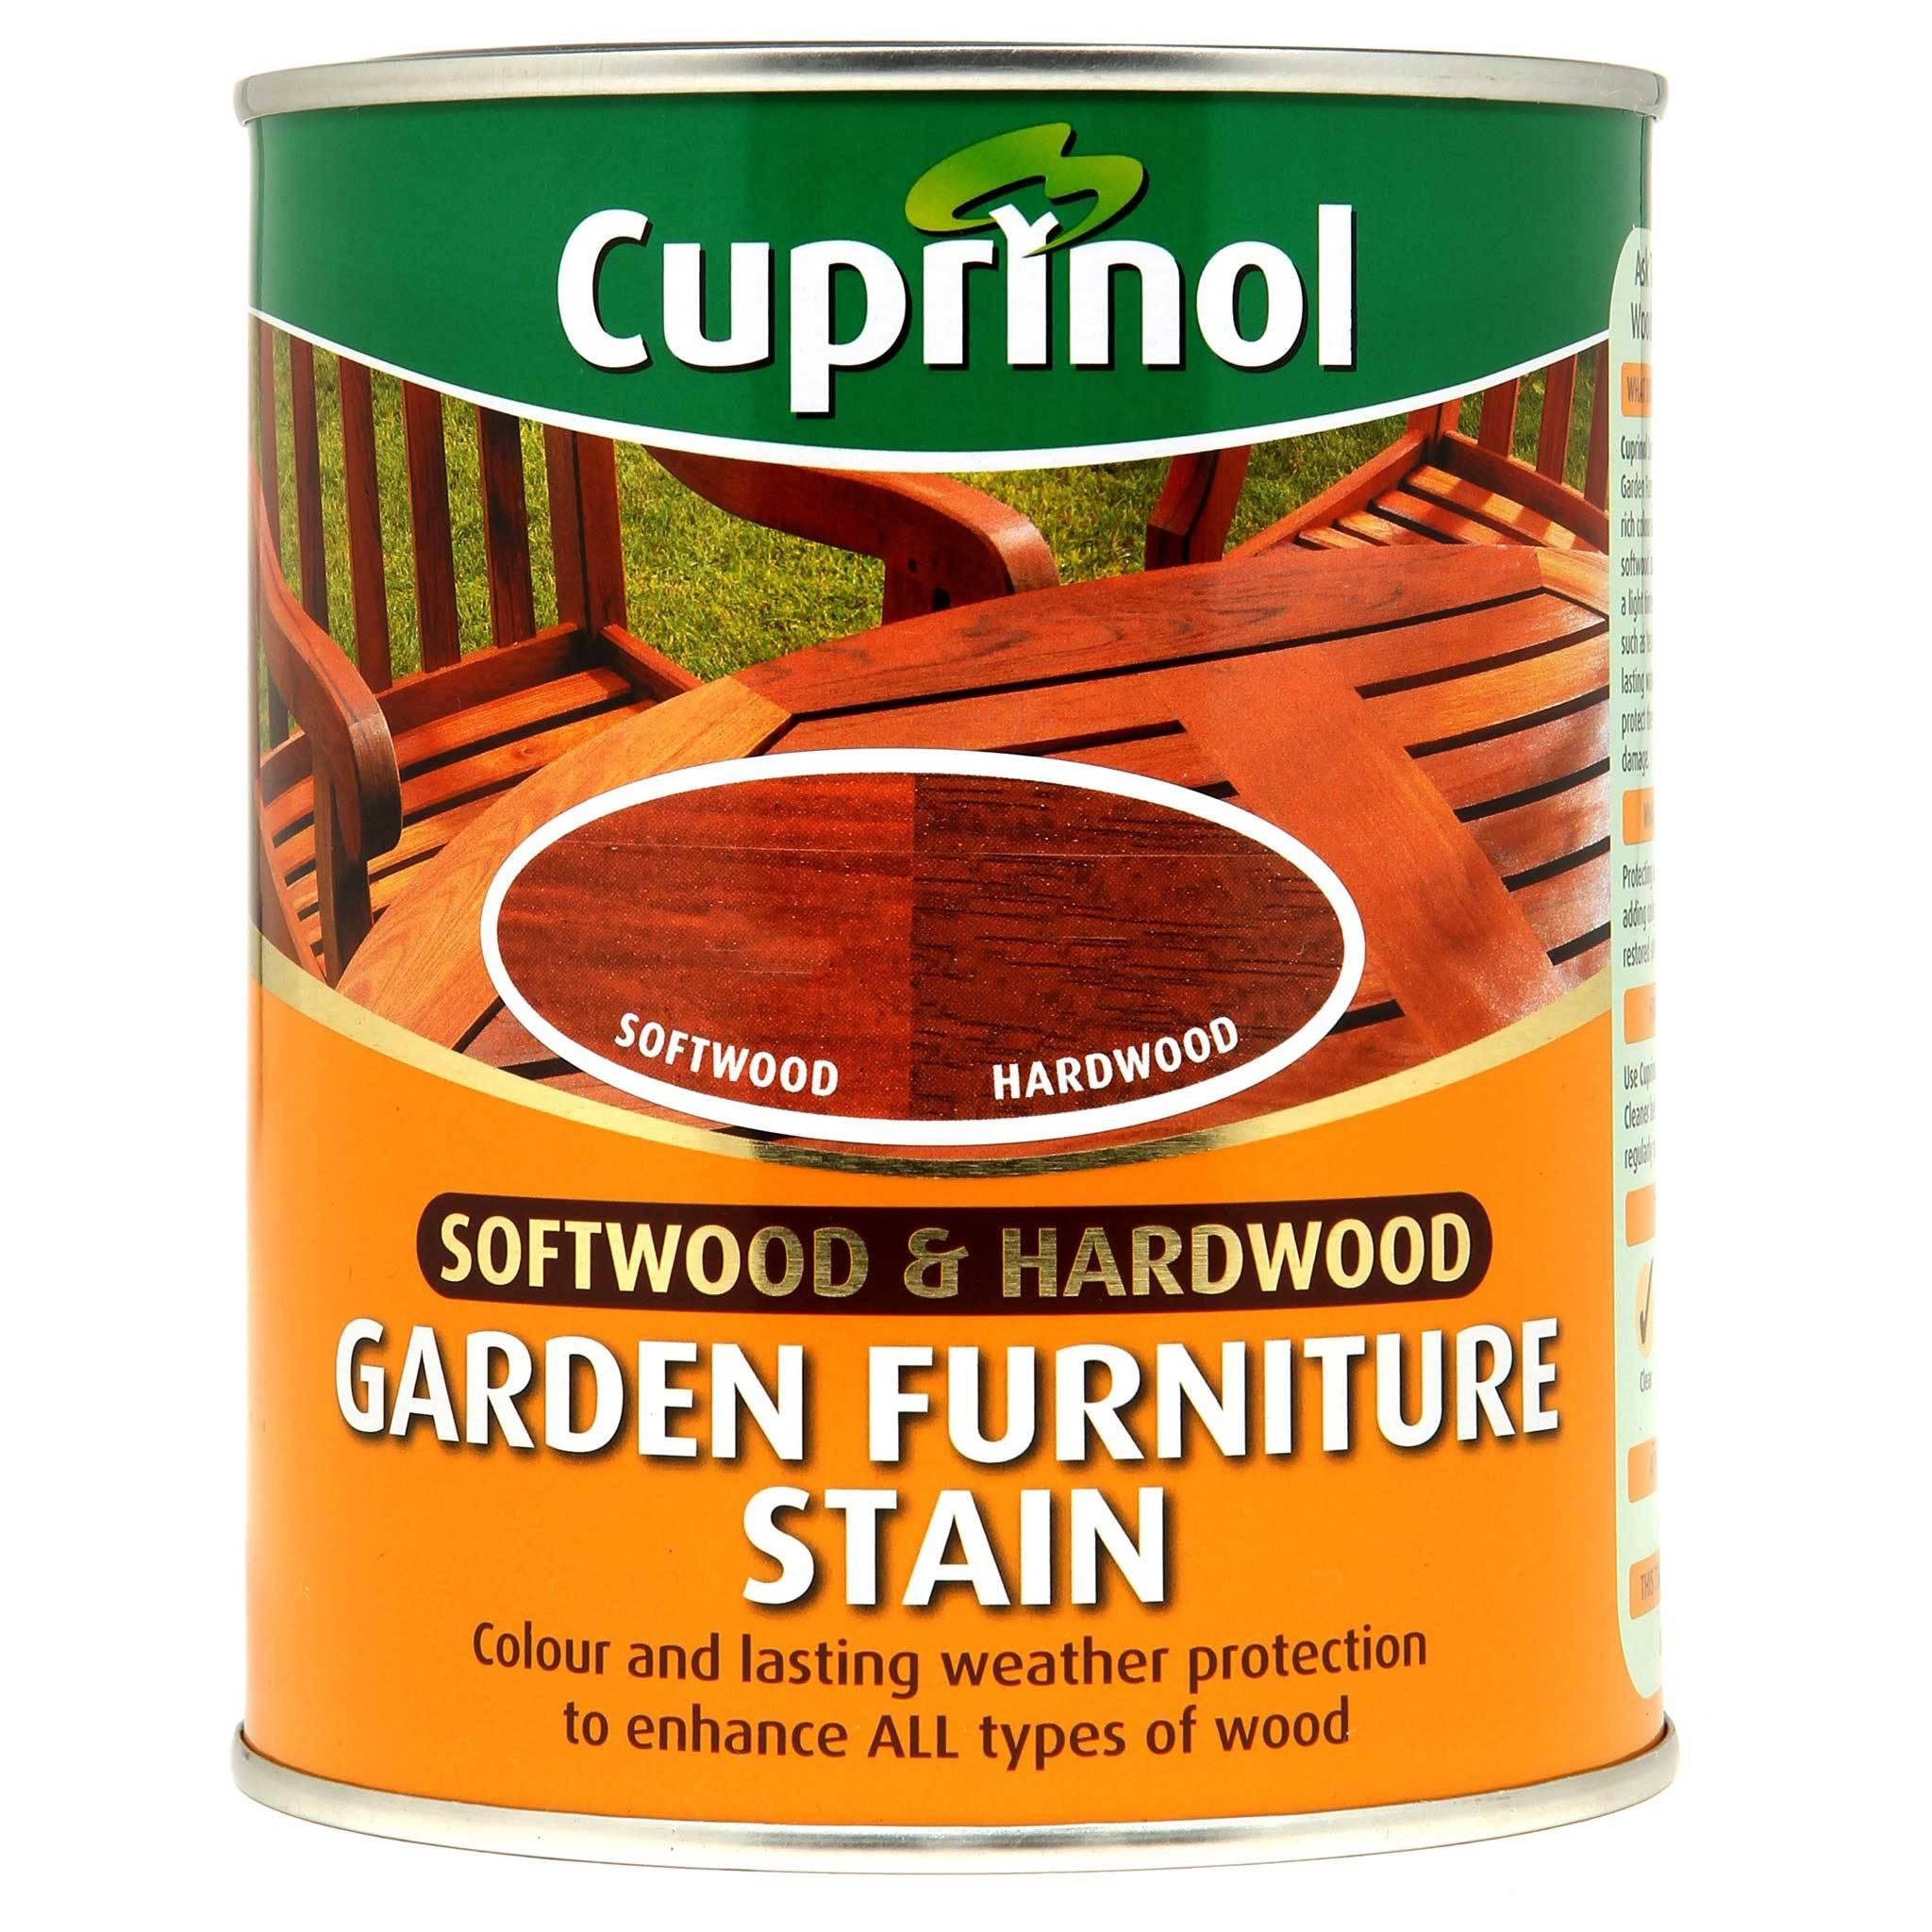 cuprinol garden furniture stain 750 ml hardwood and softwood